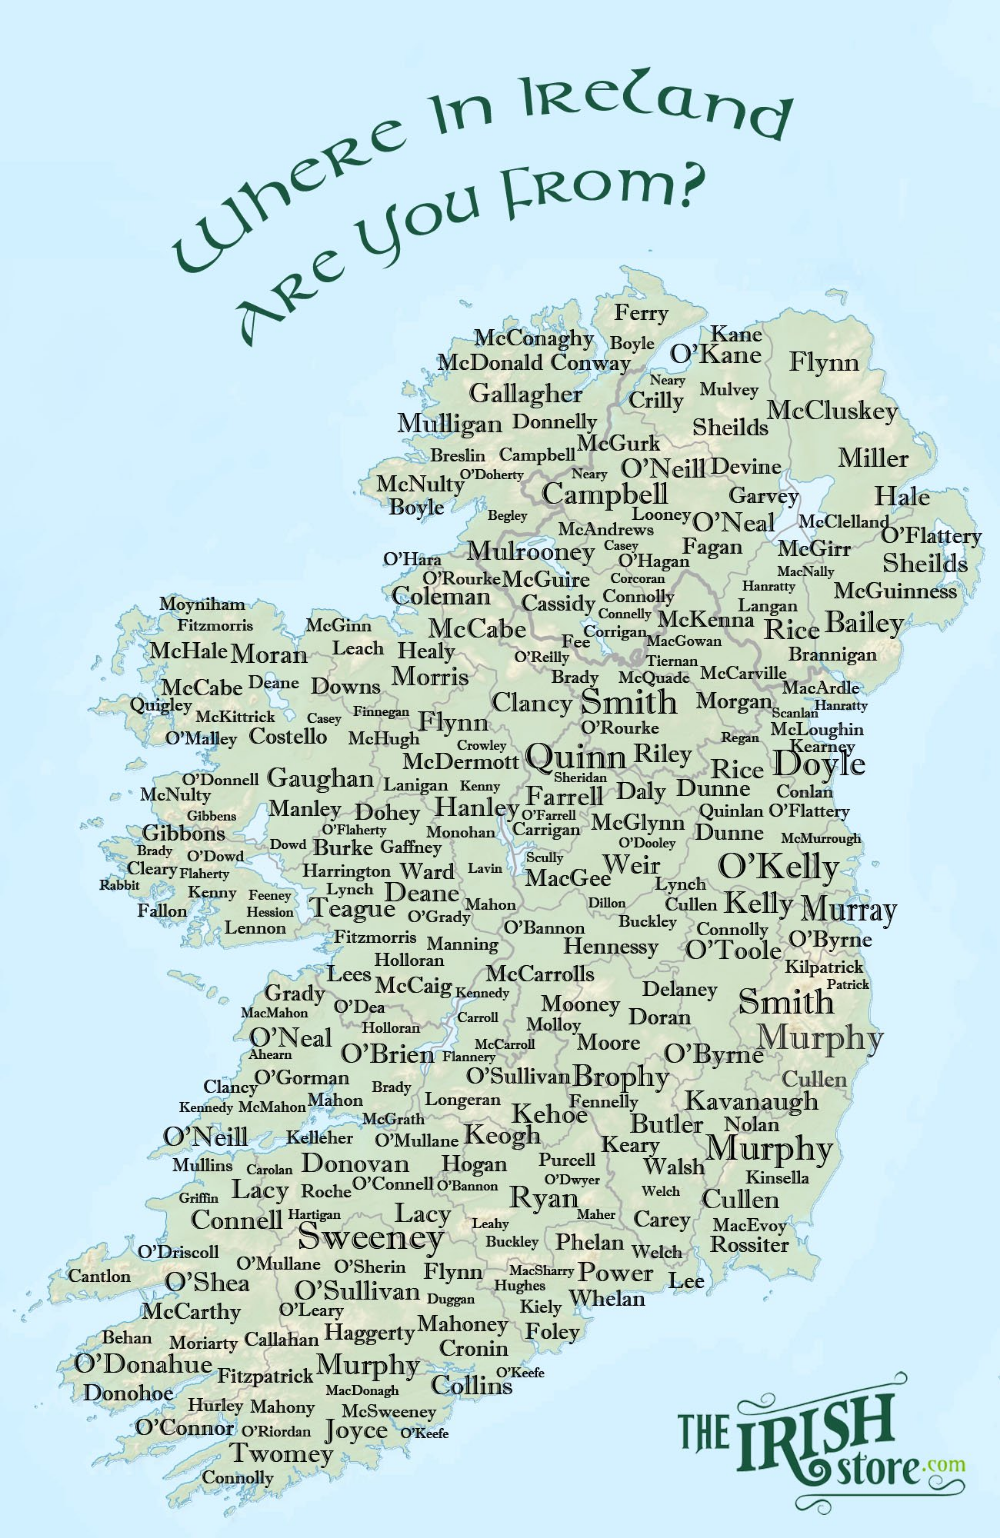 Trace your Irish roots | TheIrishStore.com